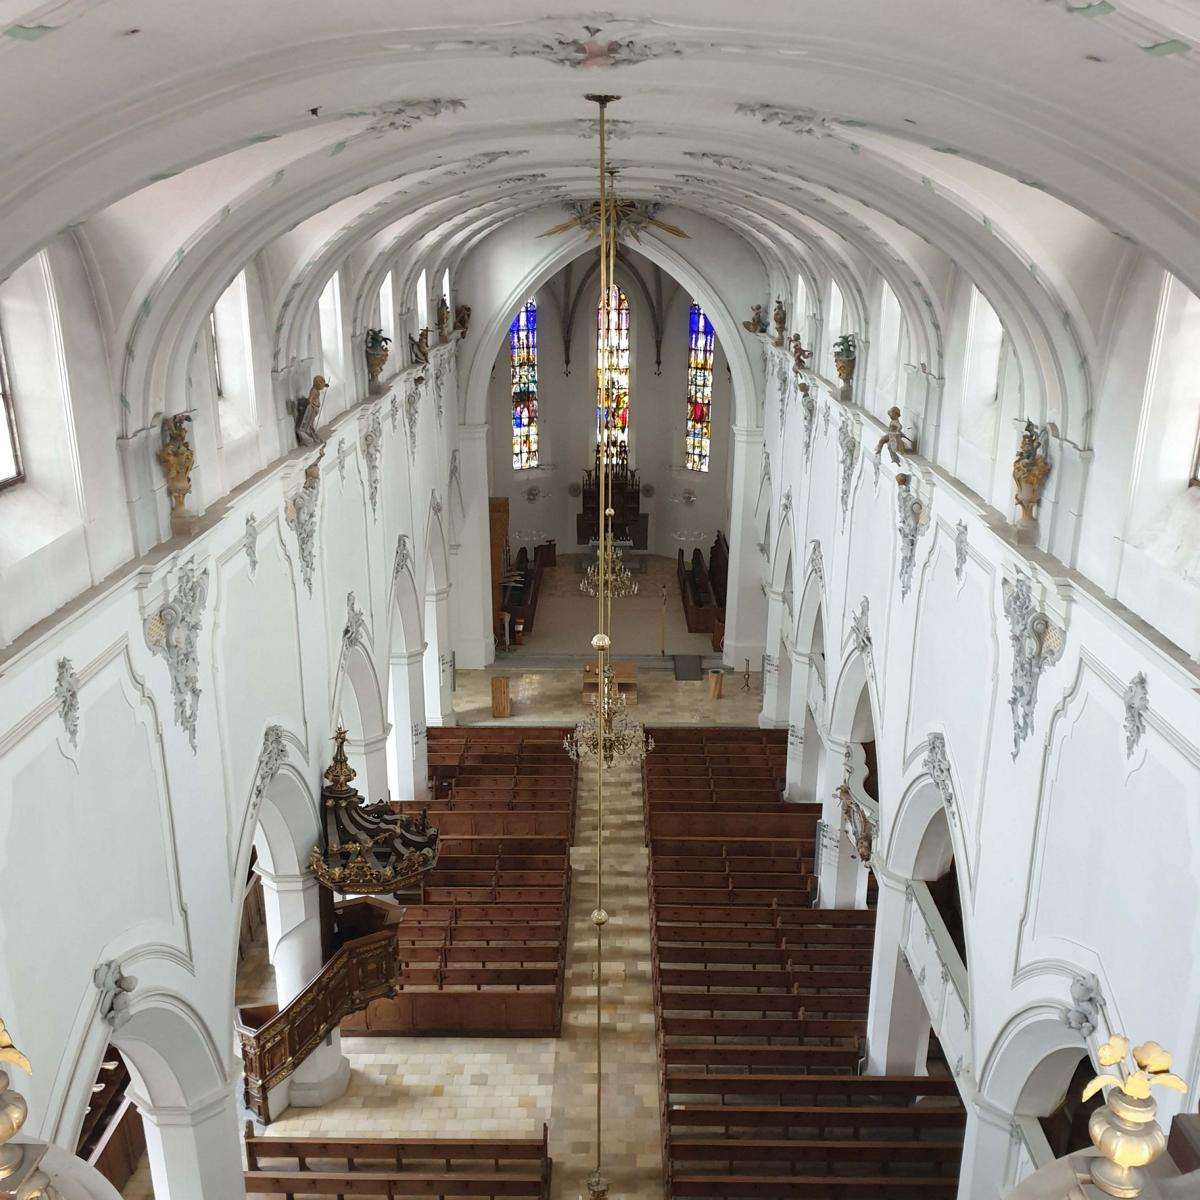 St. Mang Kirche